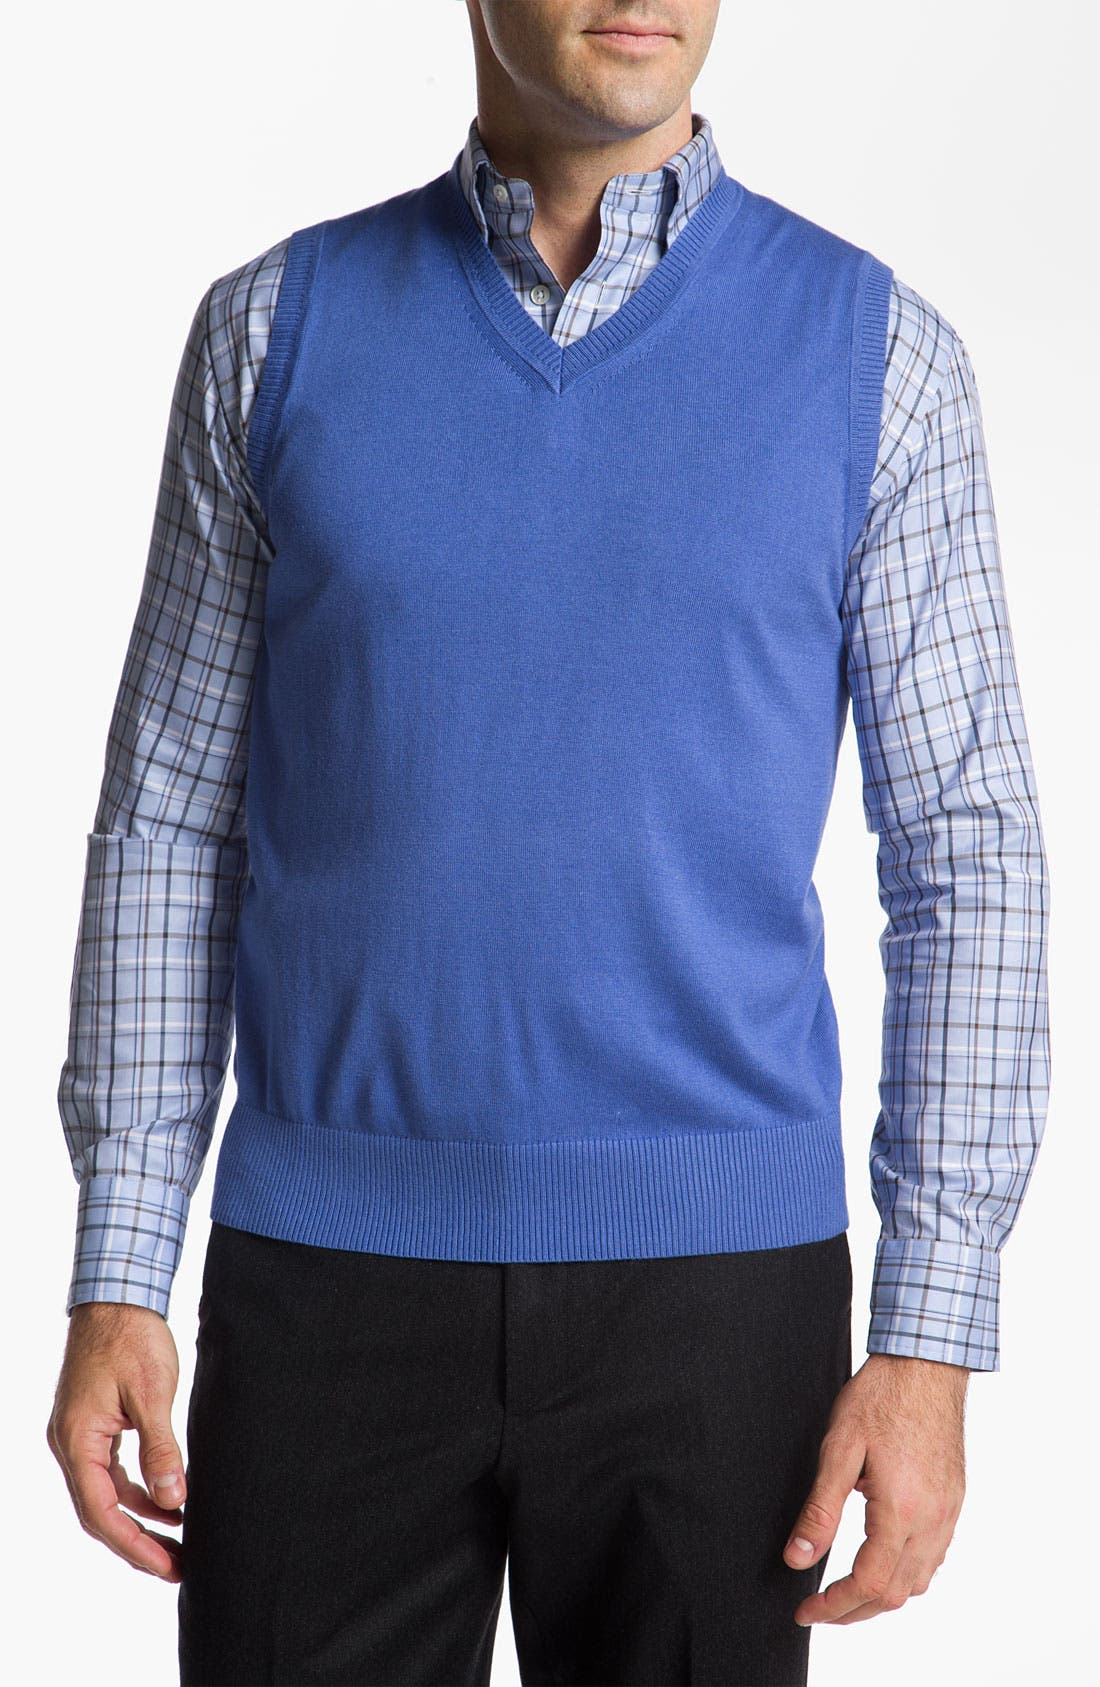 Alternate Image 1 Selected - Façonnable 'Sicoca' Vest